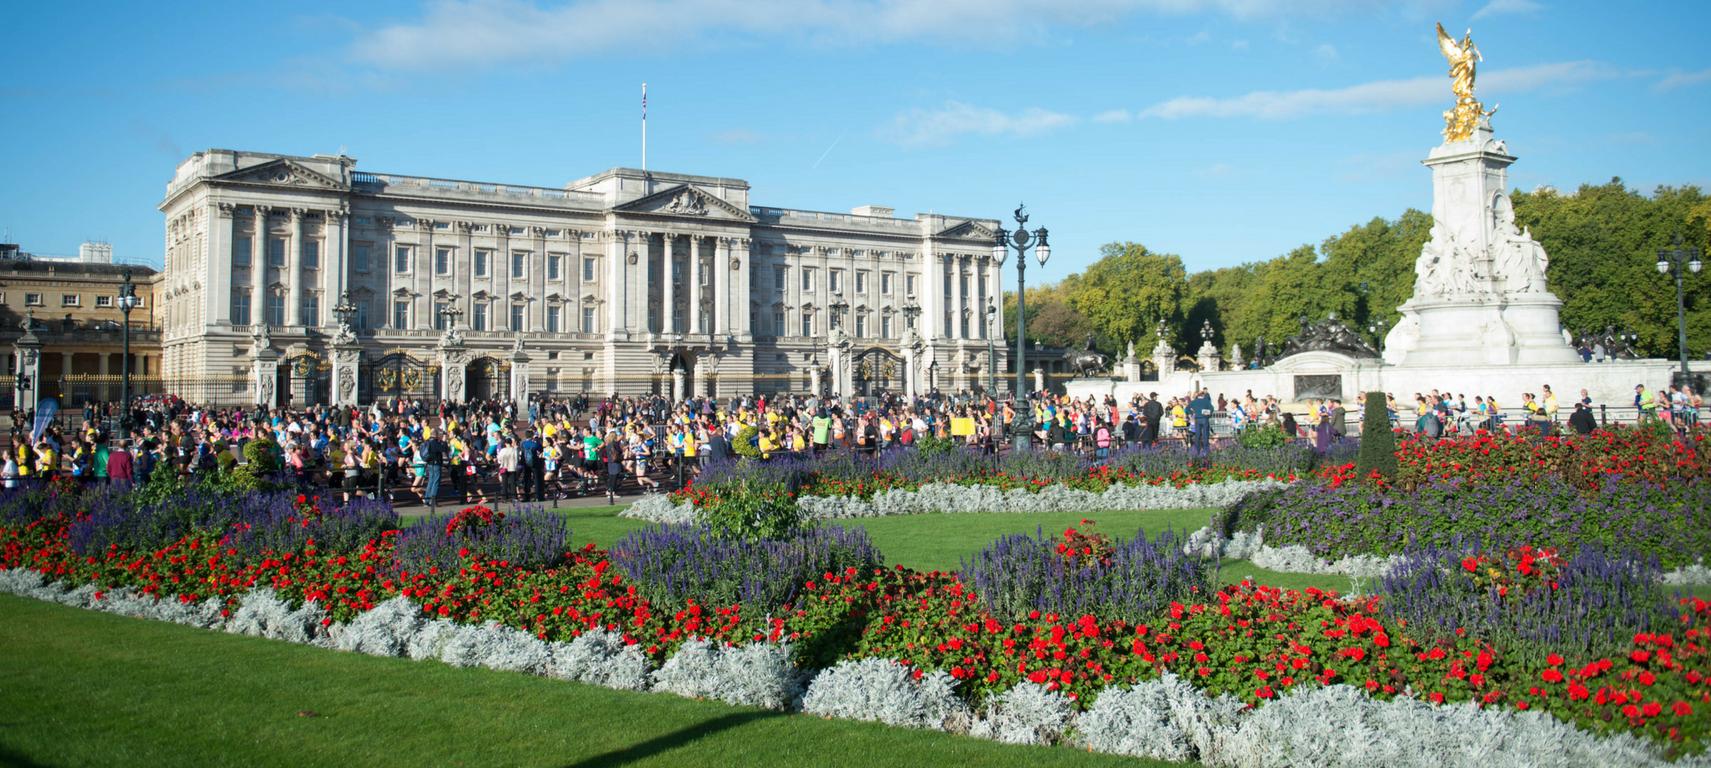 Royal parks half marathon.png